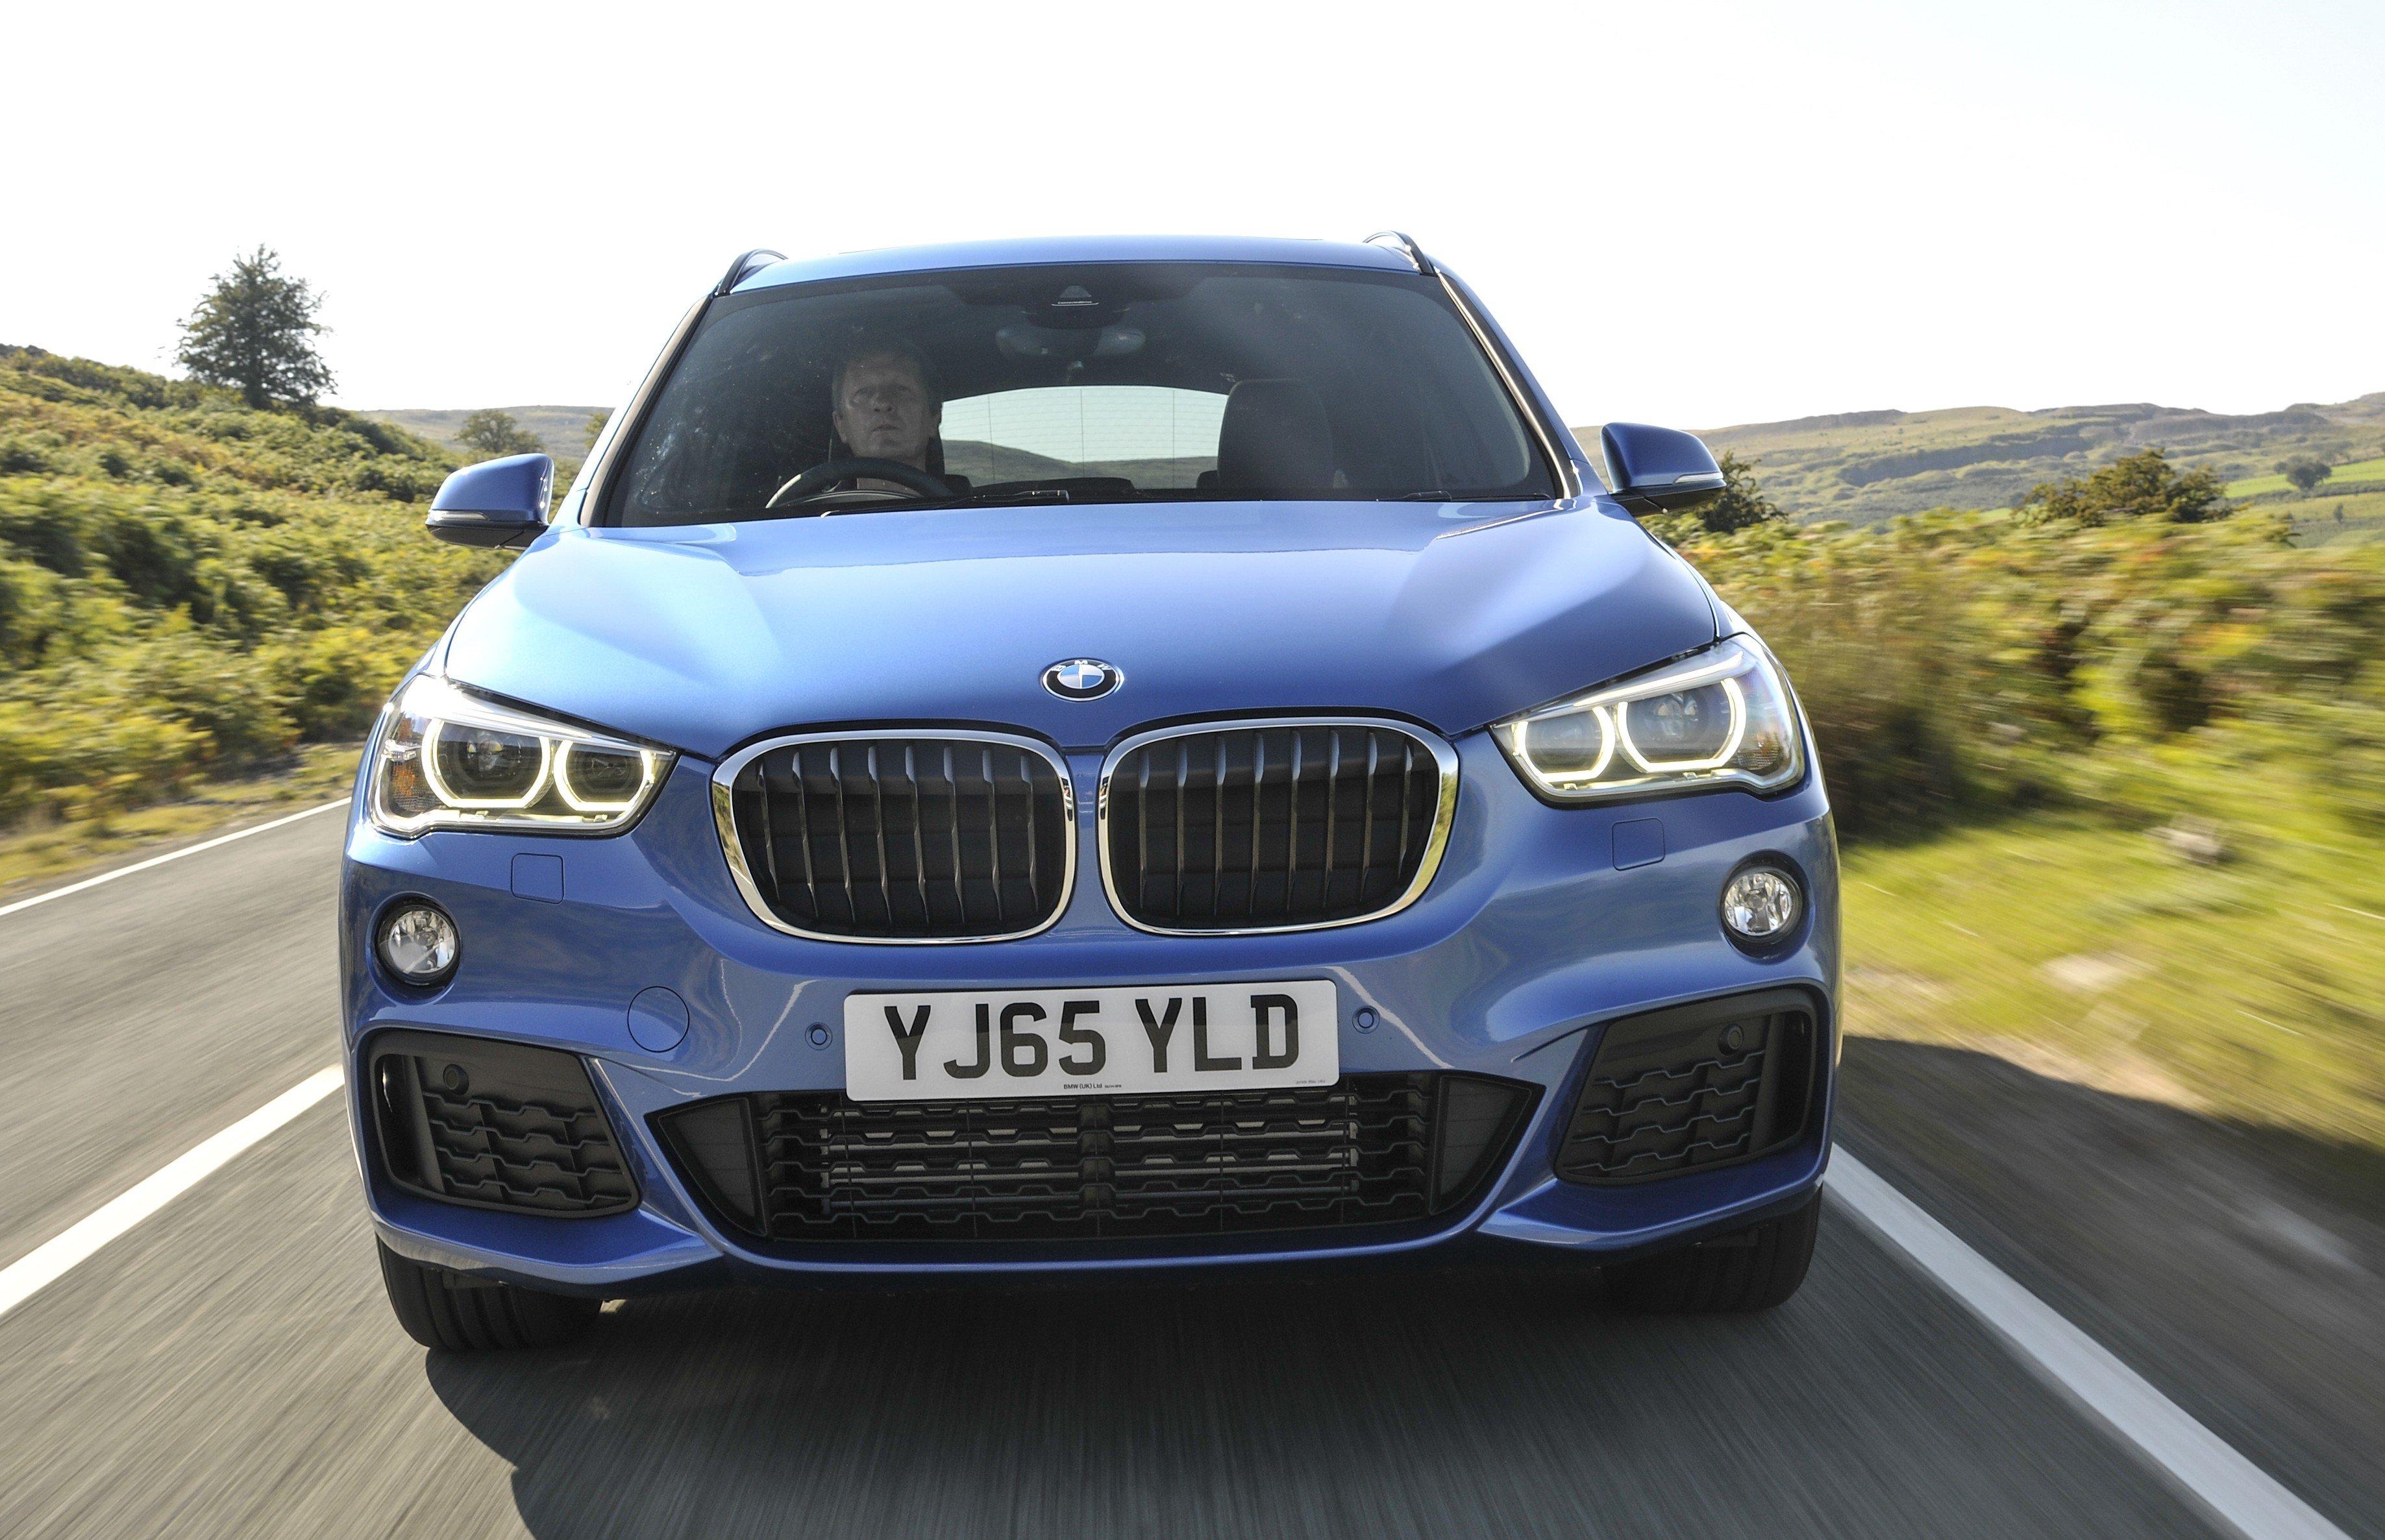 2015 Bmw X1 >> MEGA GALLERY: F48 BMW X1 in the UK, plus M Sport Paul Tan - Image 382145